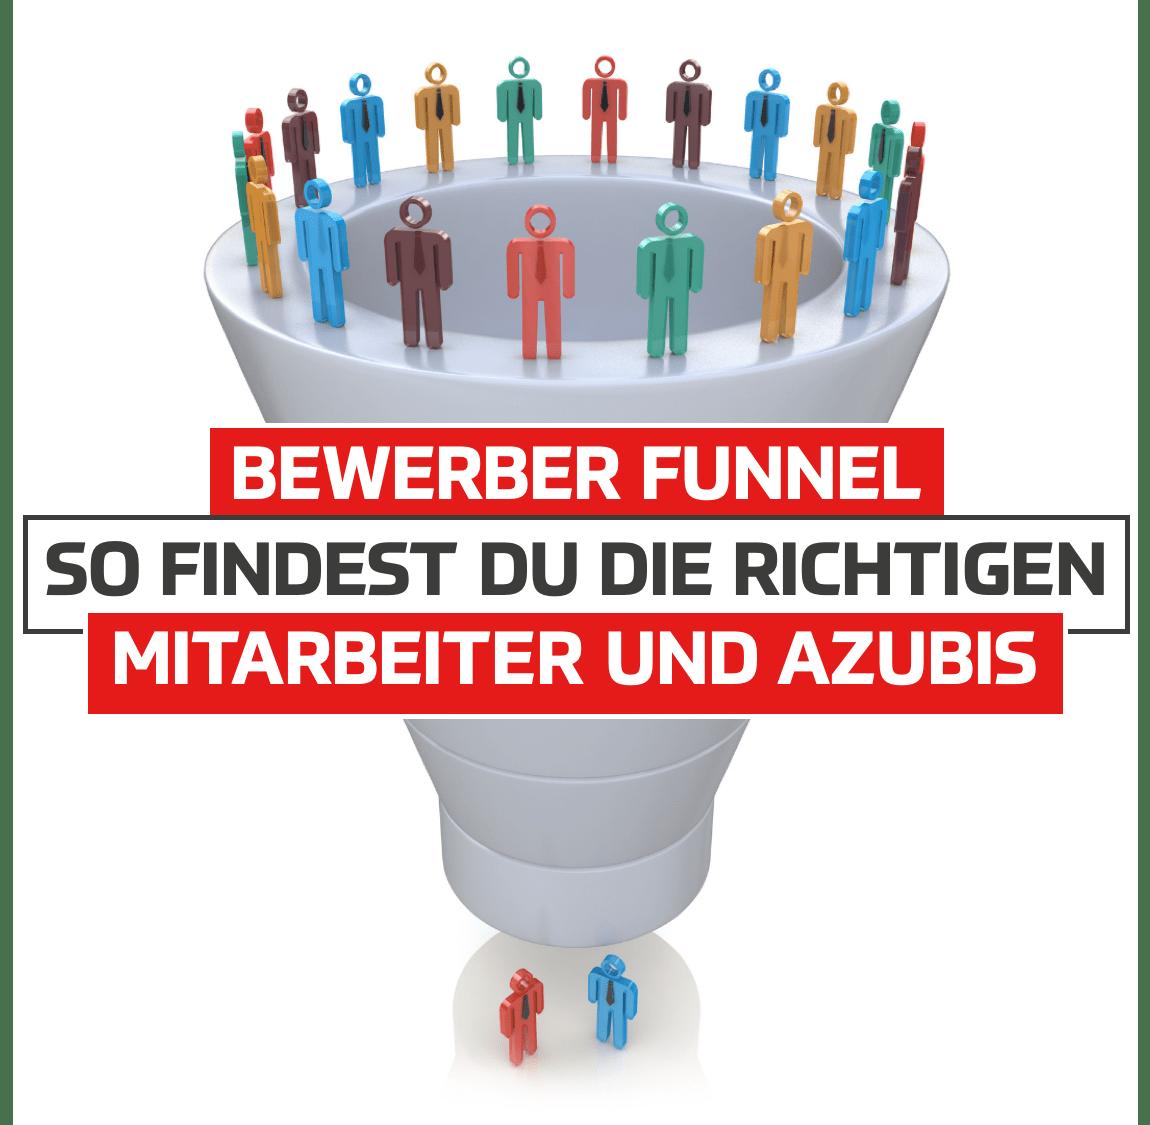 Bewerber Funnel